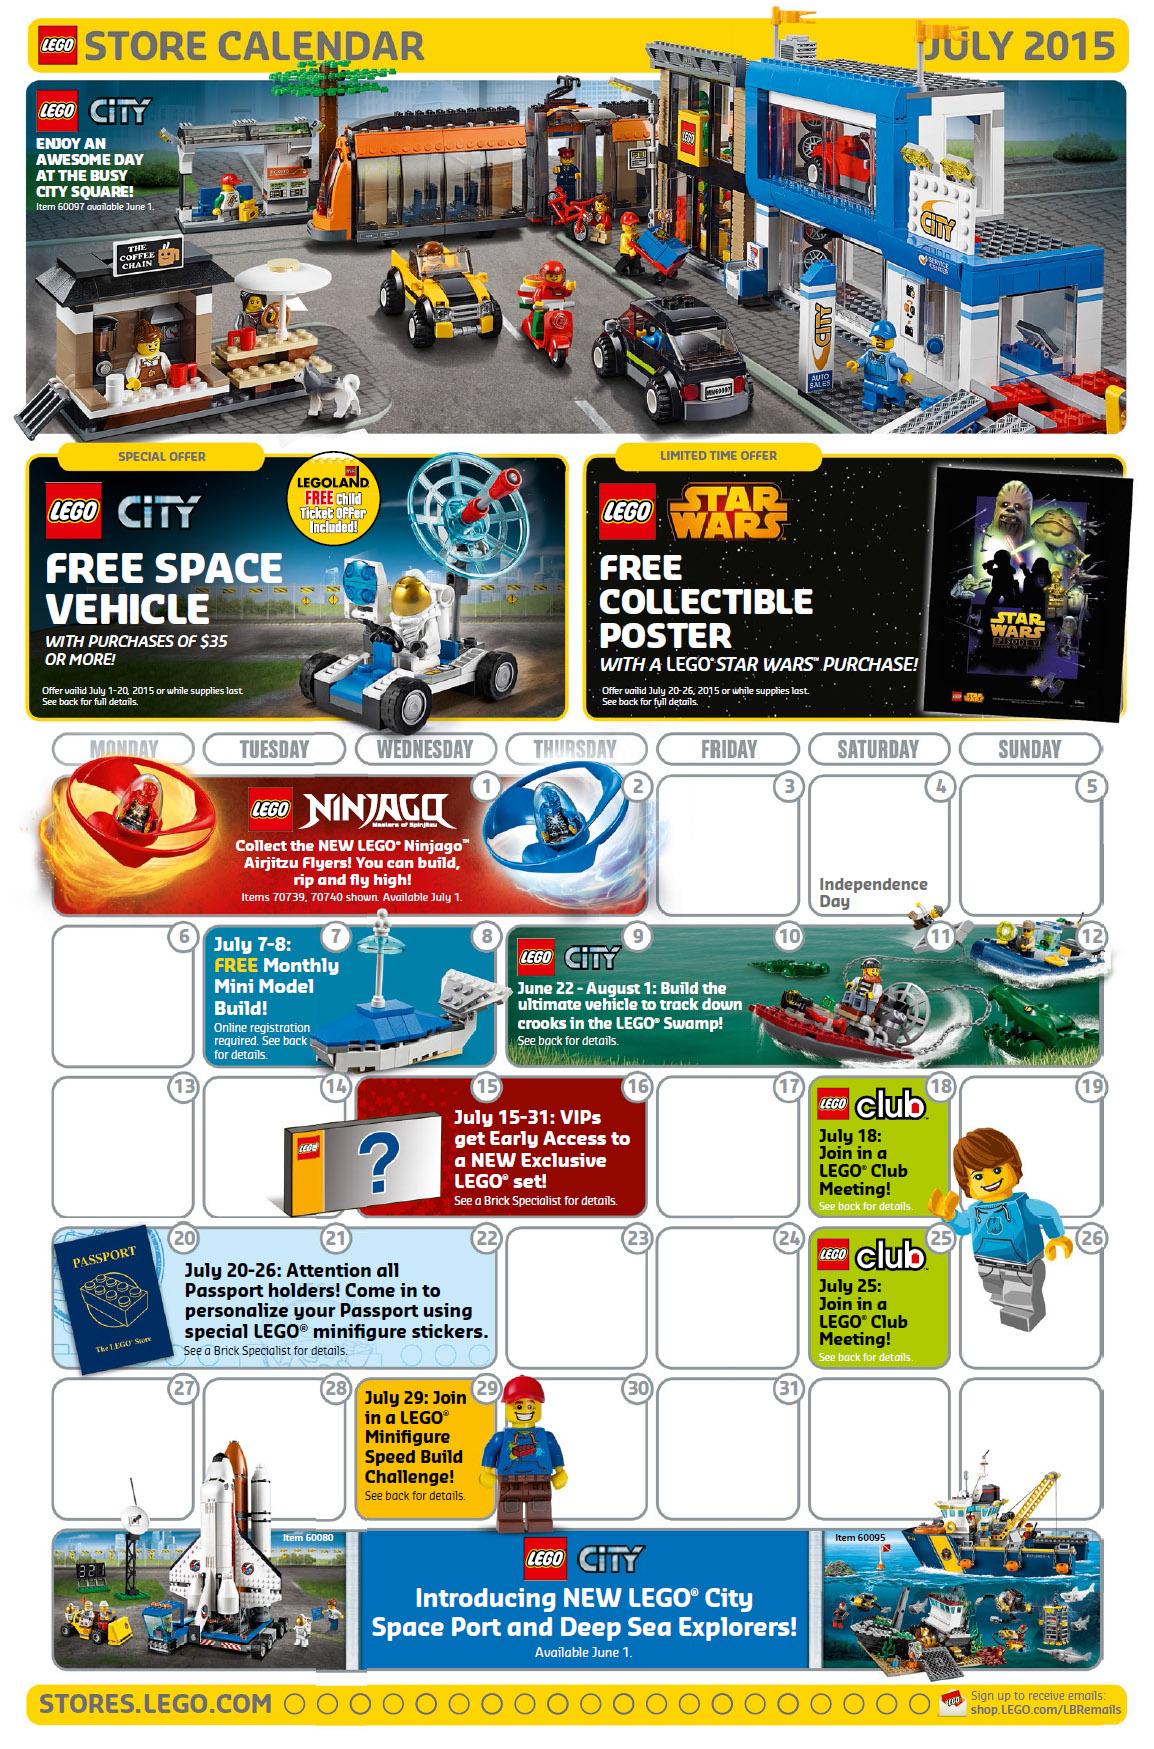 Calendar Lego June : July lego store calendar free promos events